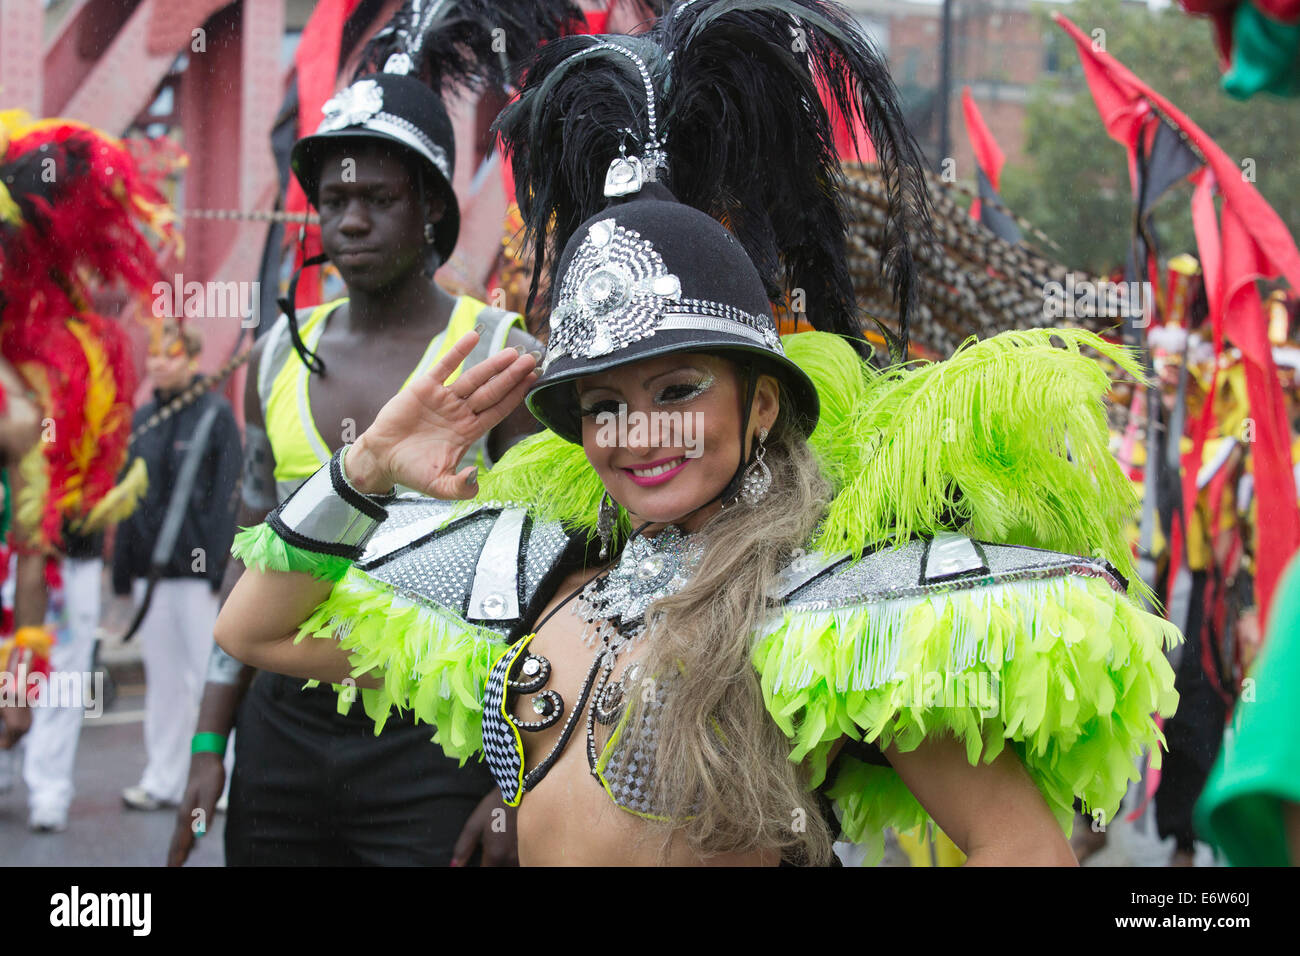 Samba Dancers from the London School of Samba at a rainy Notting Hill Carnival parade, London, UK - Stock Image